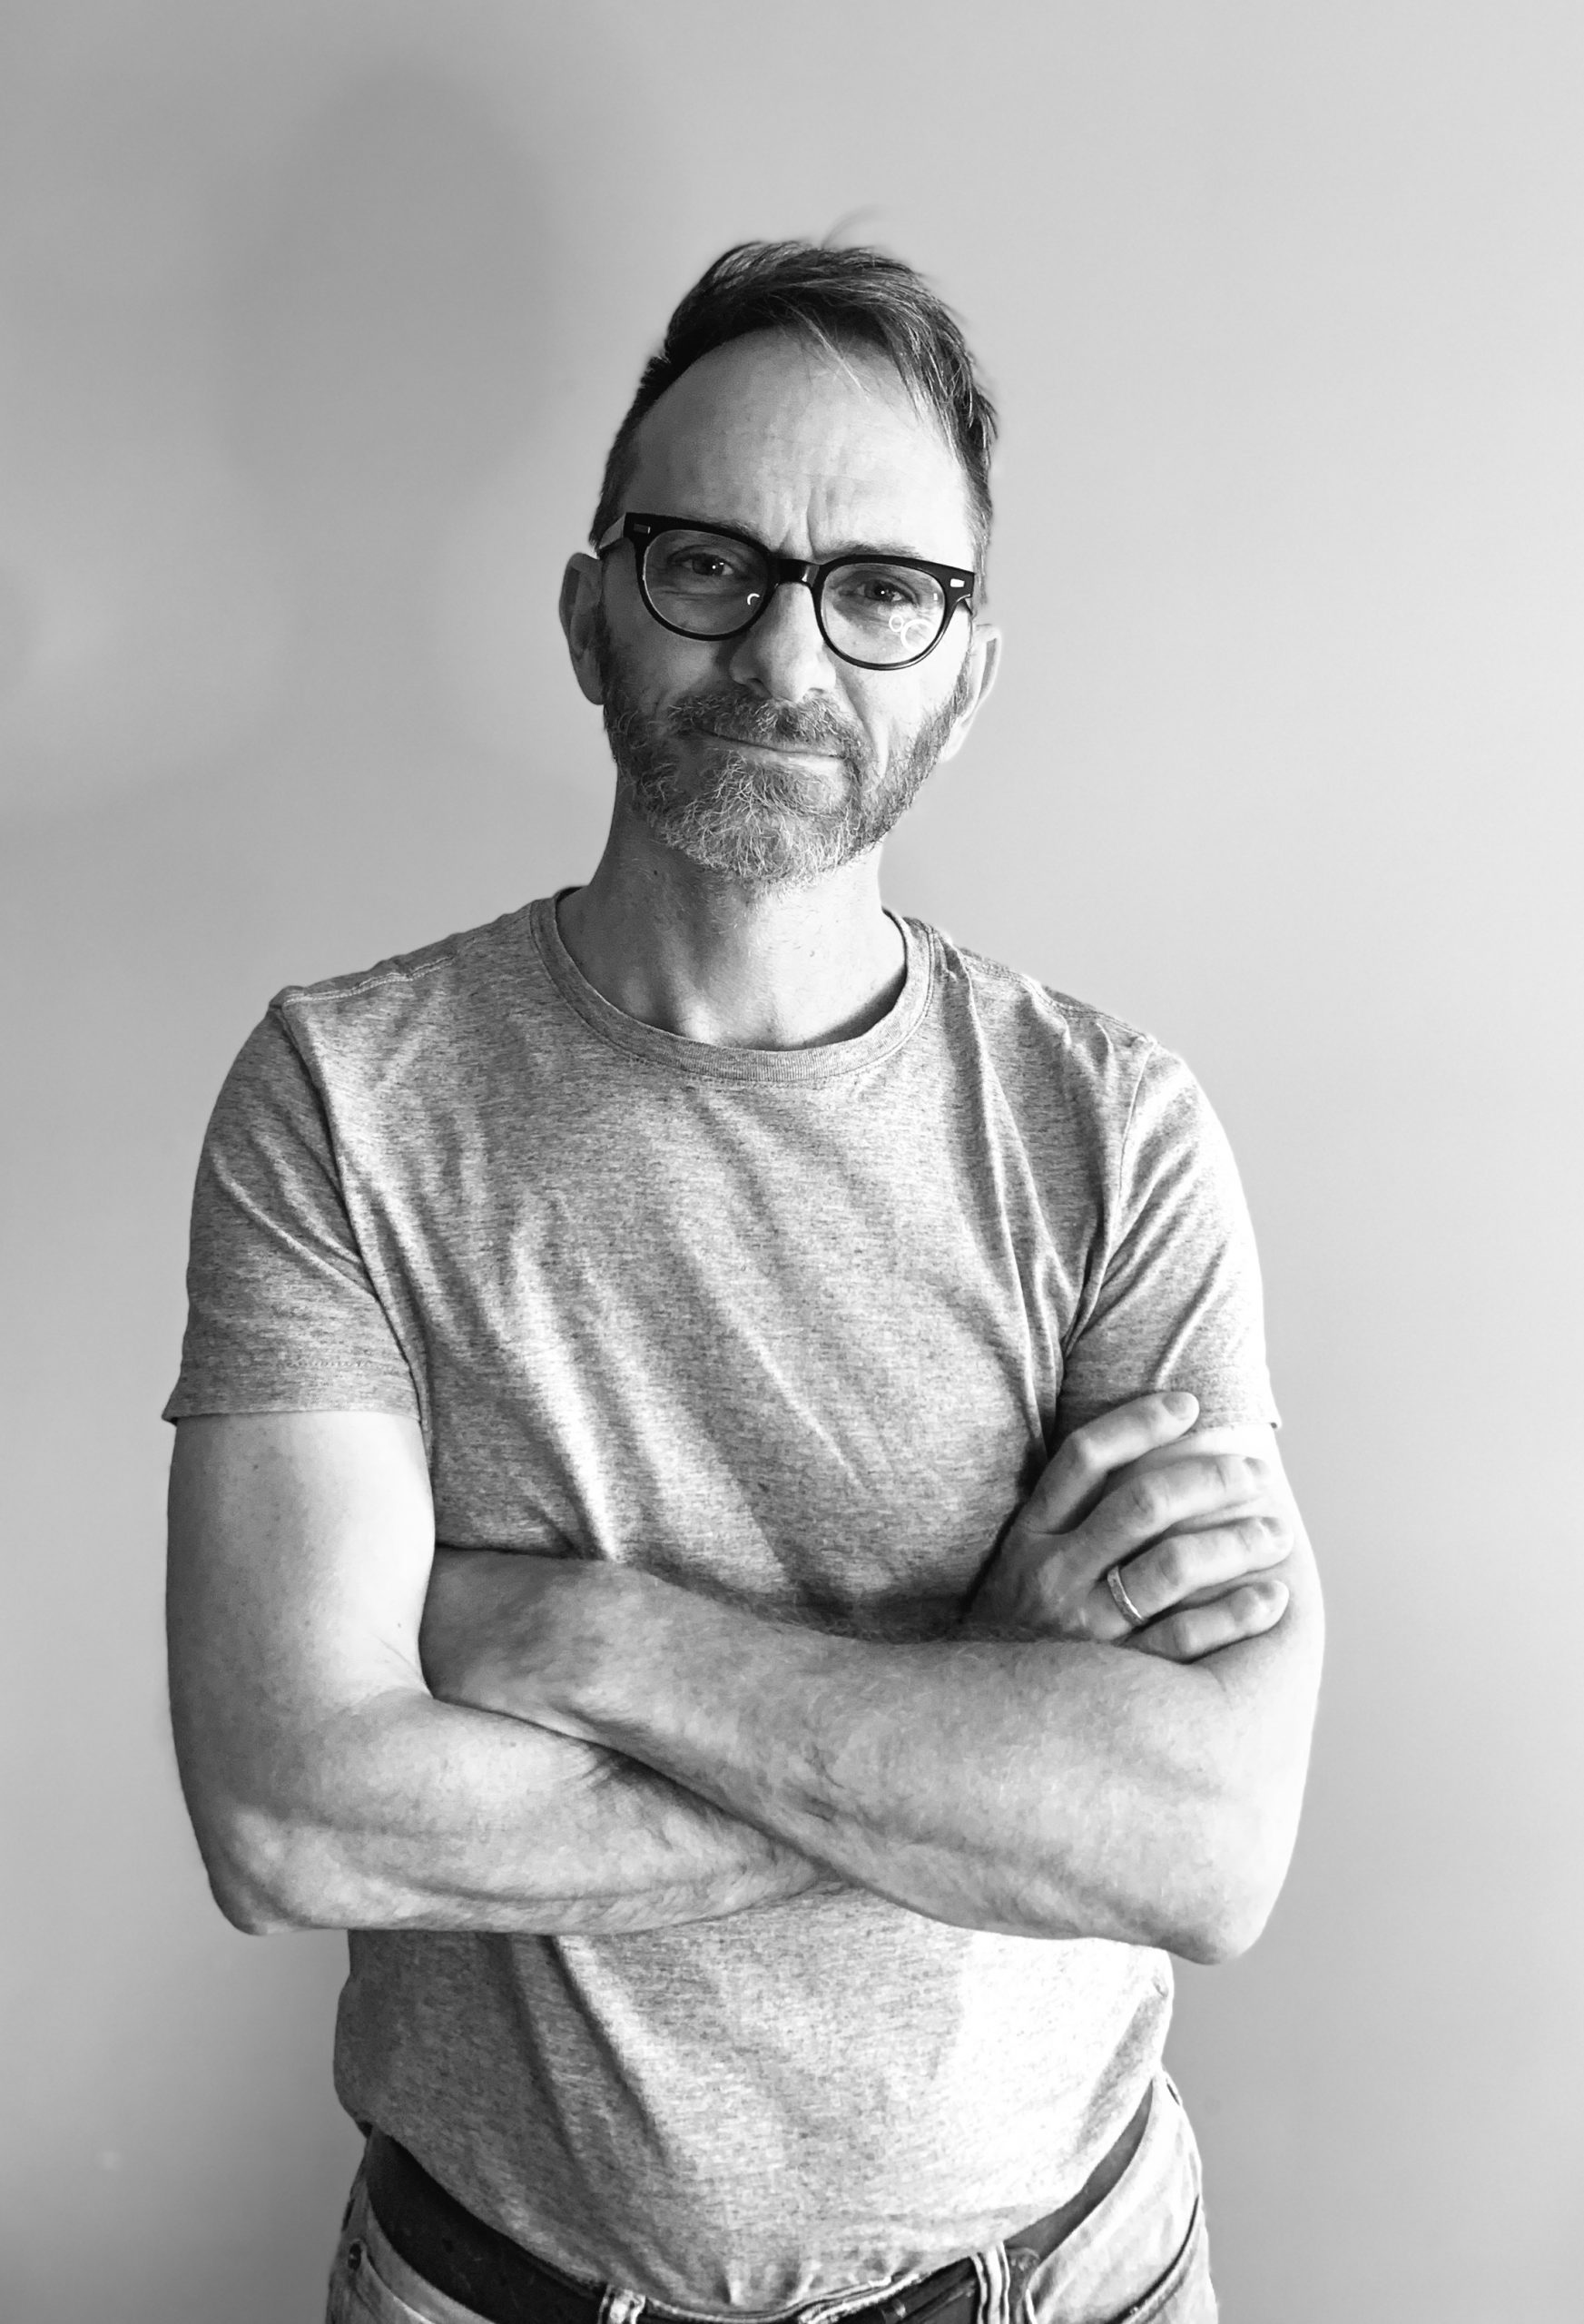 Aaron Holbrough